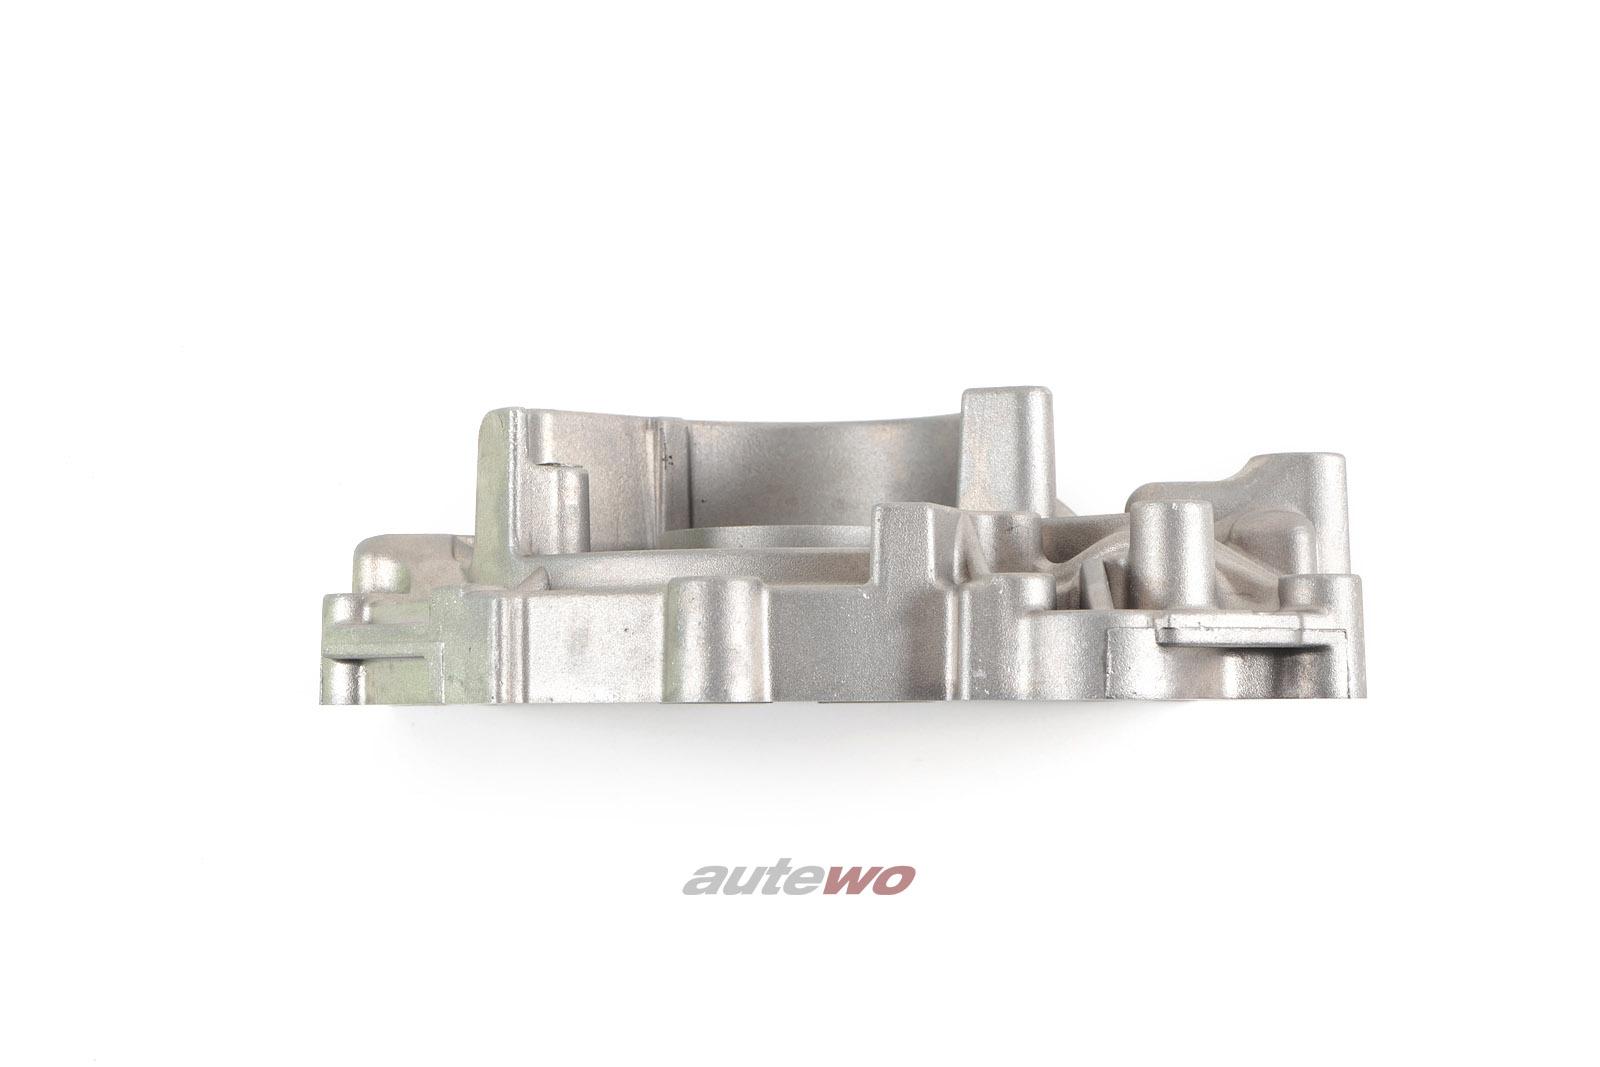 054115105E 054115109B NEU! Audi S2/S4/S6 C4/RS2/80 B4/100/A6 C4 5 Zyl. Ölpumpe